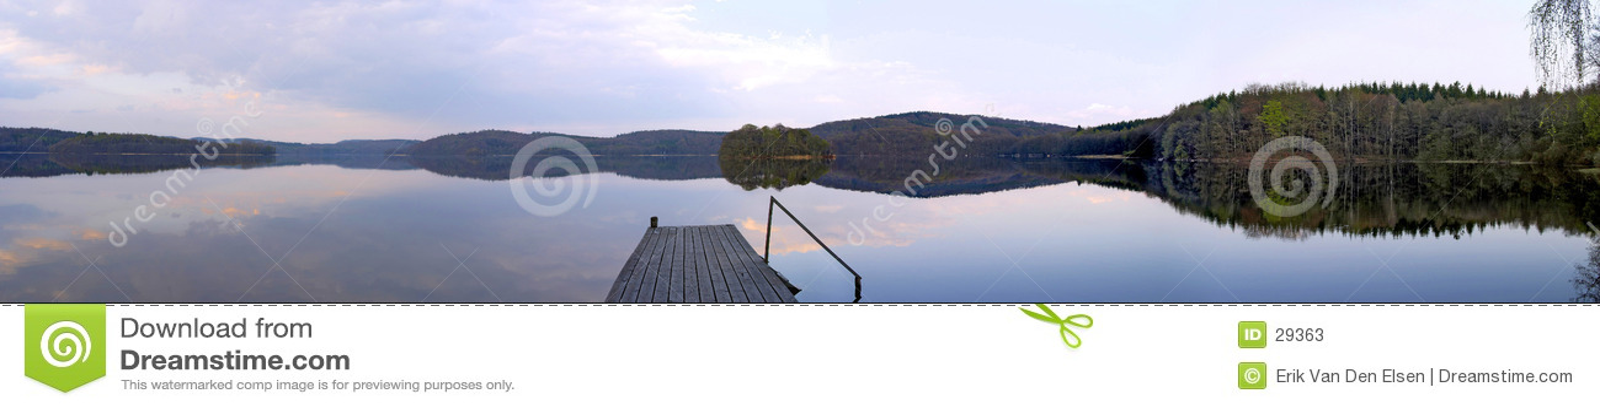 Panorama de lac sweden